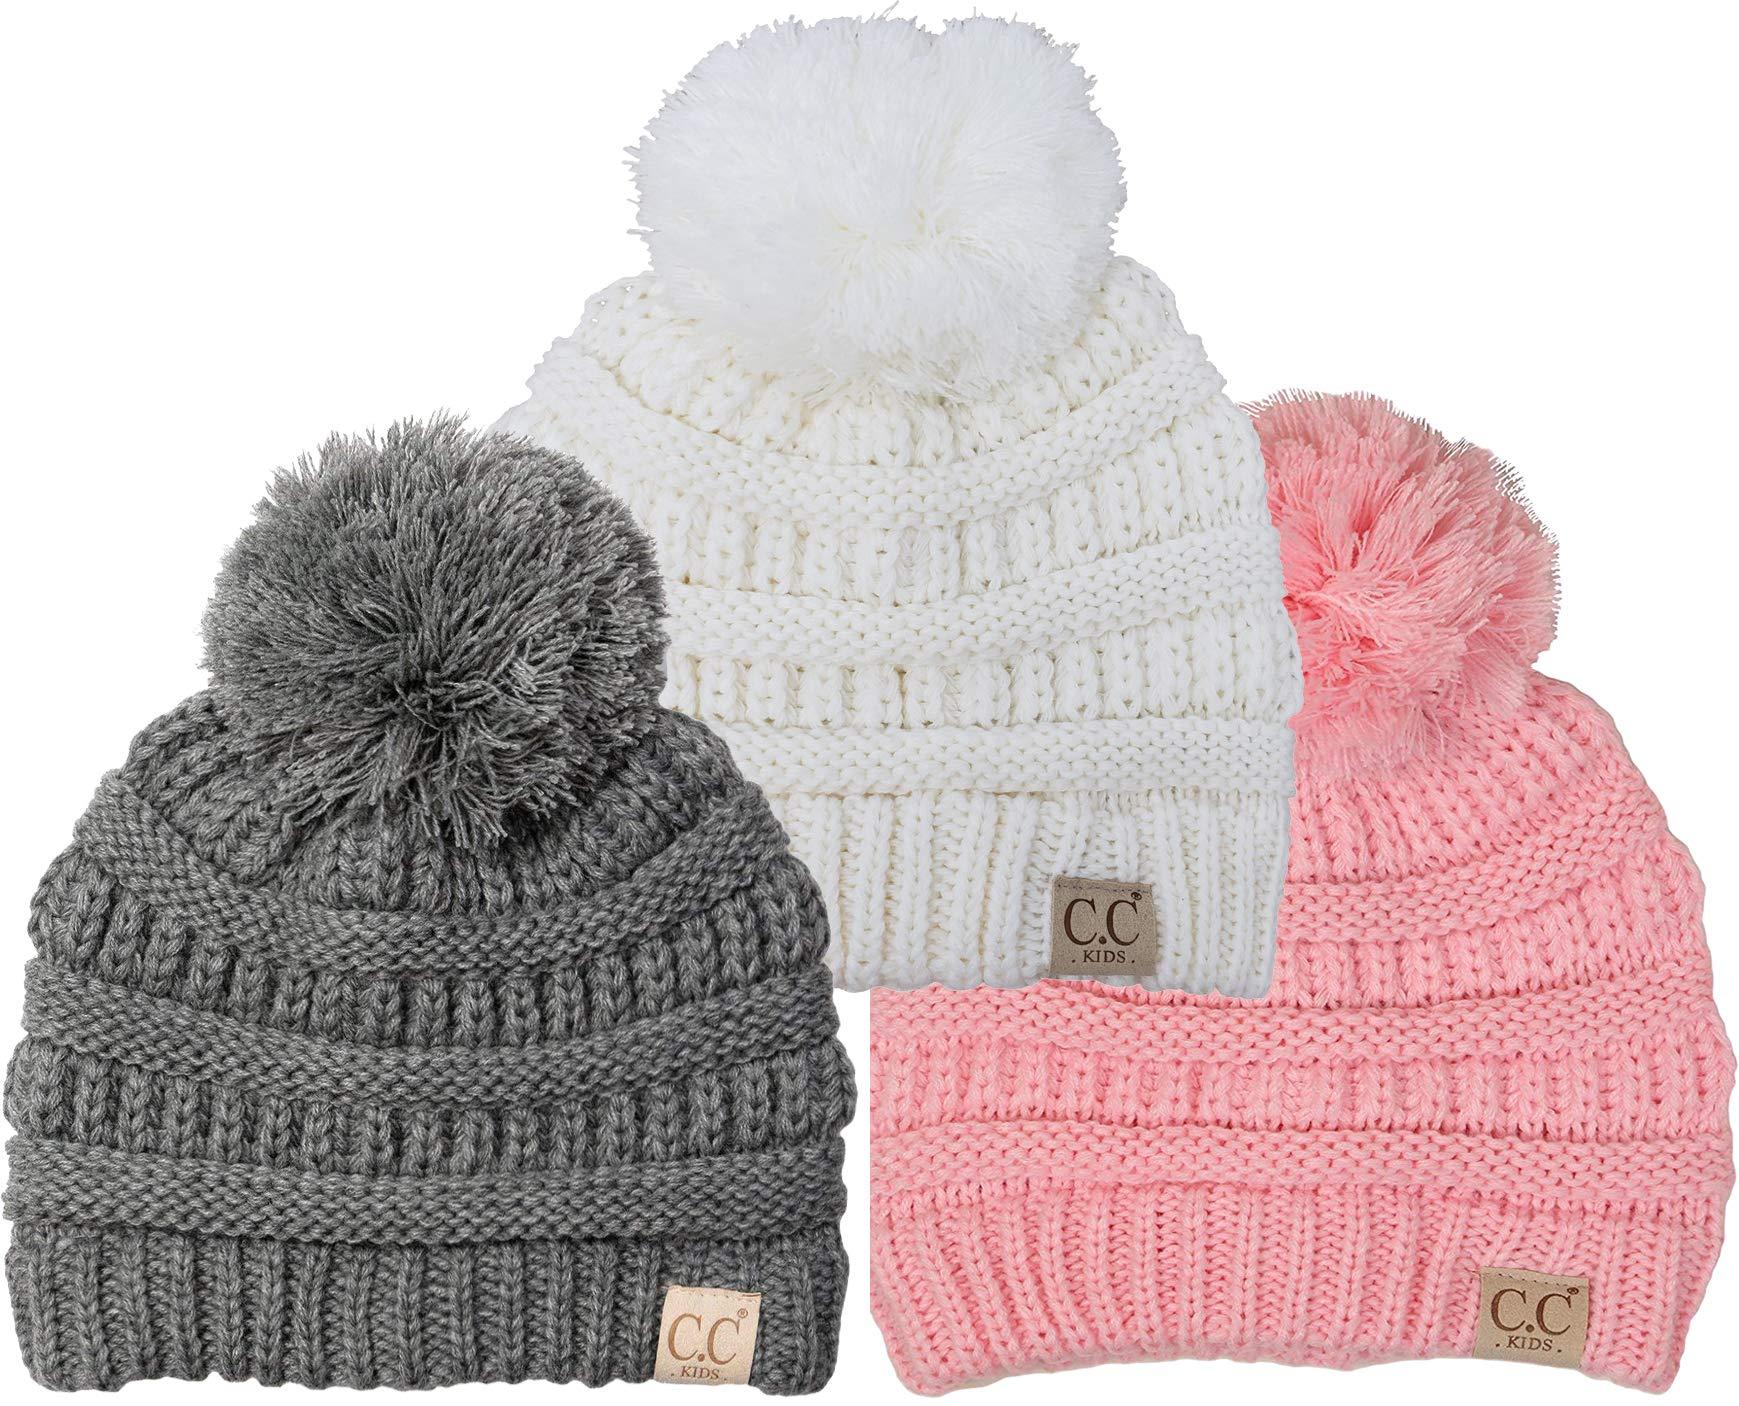 H-6847-3-212529 Kids Pom Beanie Bundle: Grey, Ivory, Pale Pink (3 Pack)